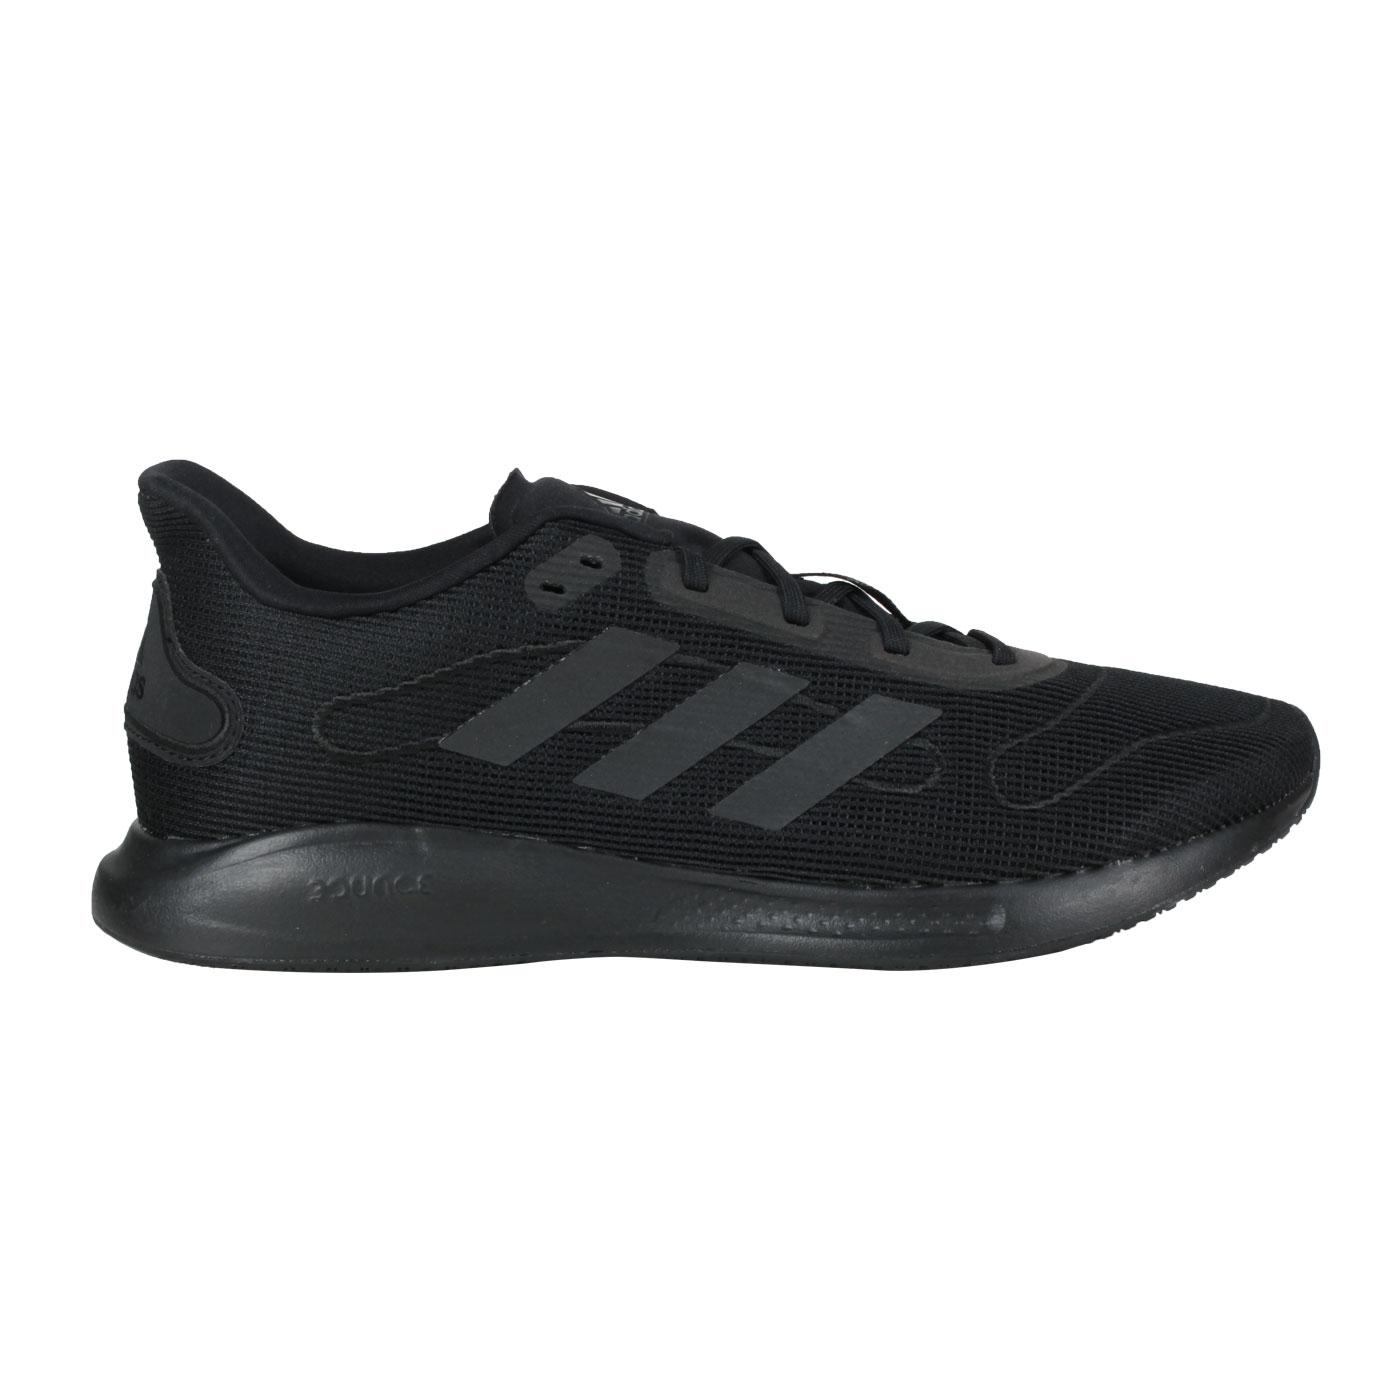 ADIDAS 男款運動慢跑鞋  @GALAXAR Run M@FY8976 - 黑